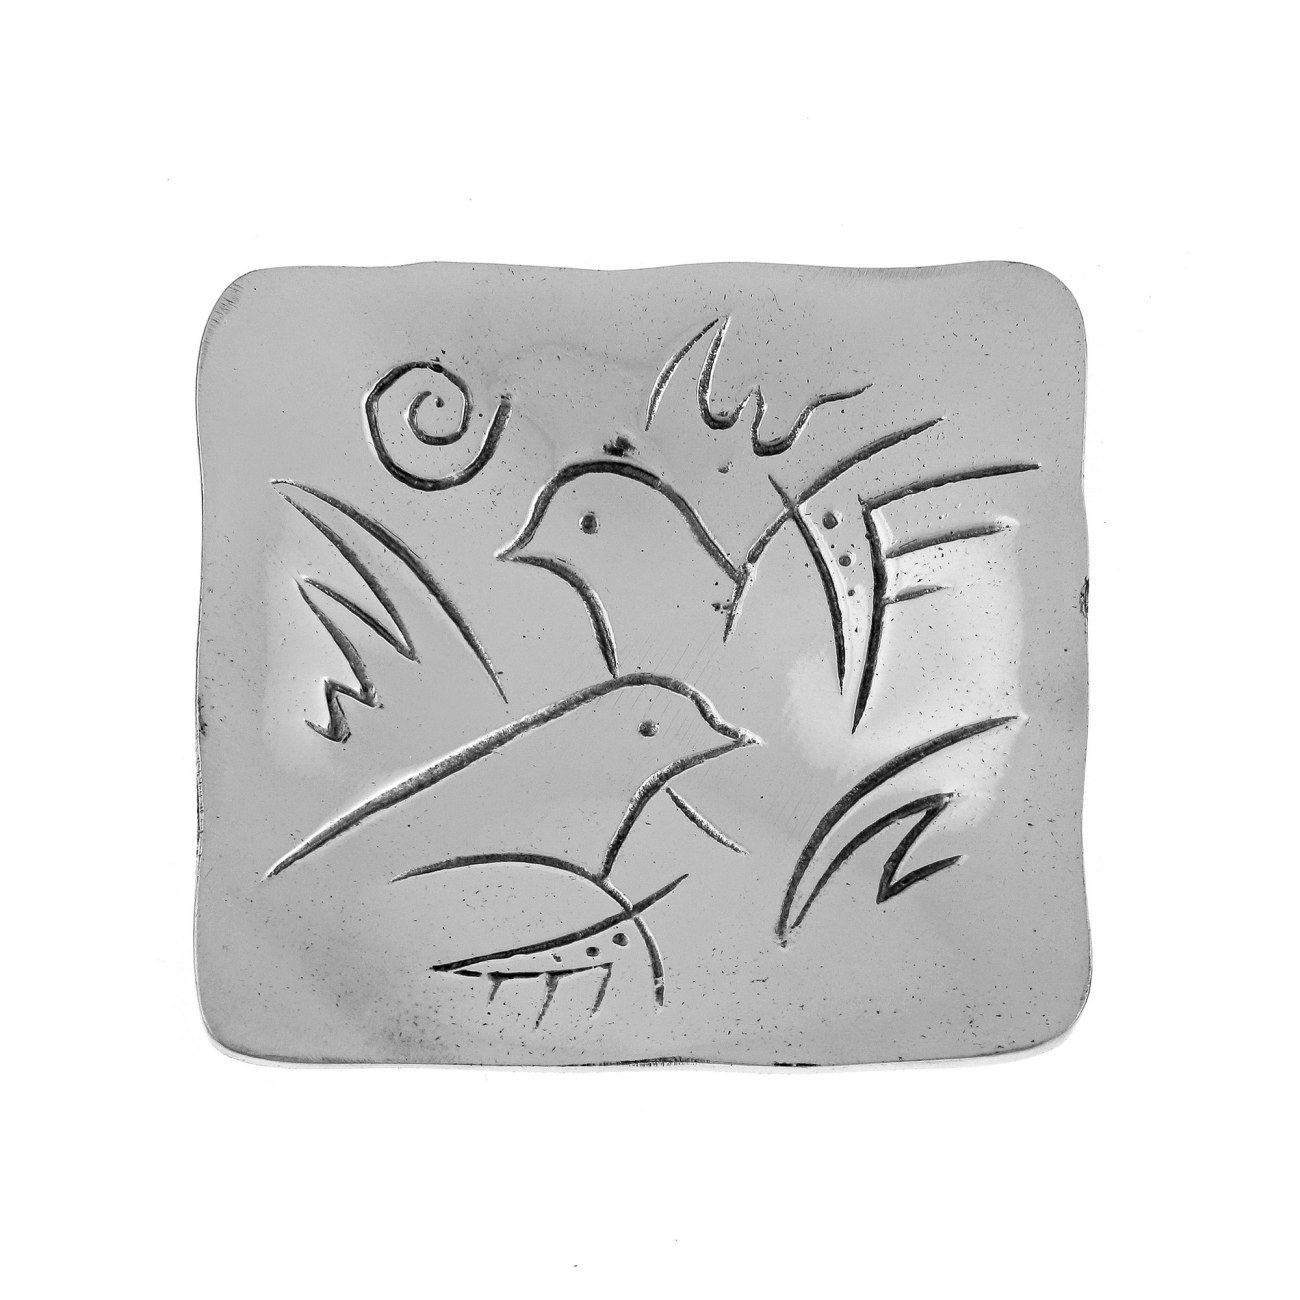 Decorative Metal Plate Engraved 2 Dove Birds Design - Handmade Solid Aluminum Silver Color 9.5x9.5cm  sc 1 st  Elite Crafters & Decorative Metal Plate Engraved 2 Dove Birds Design - Handmade ...